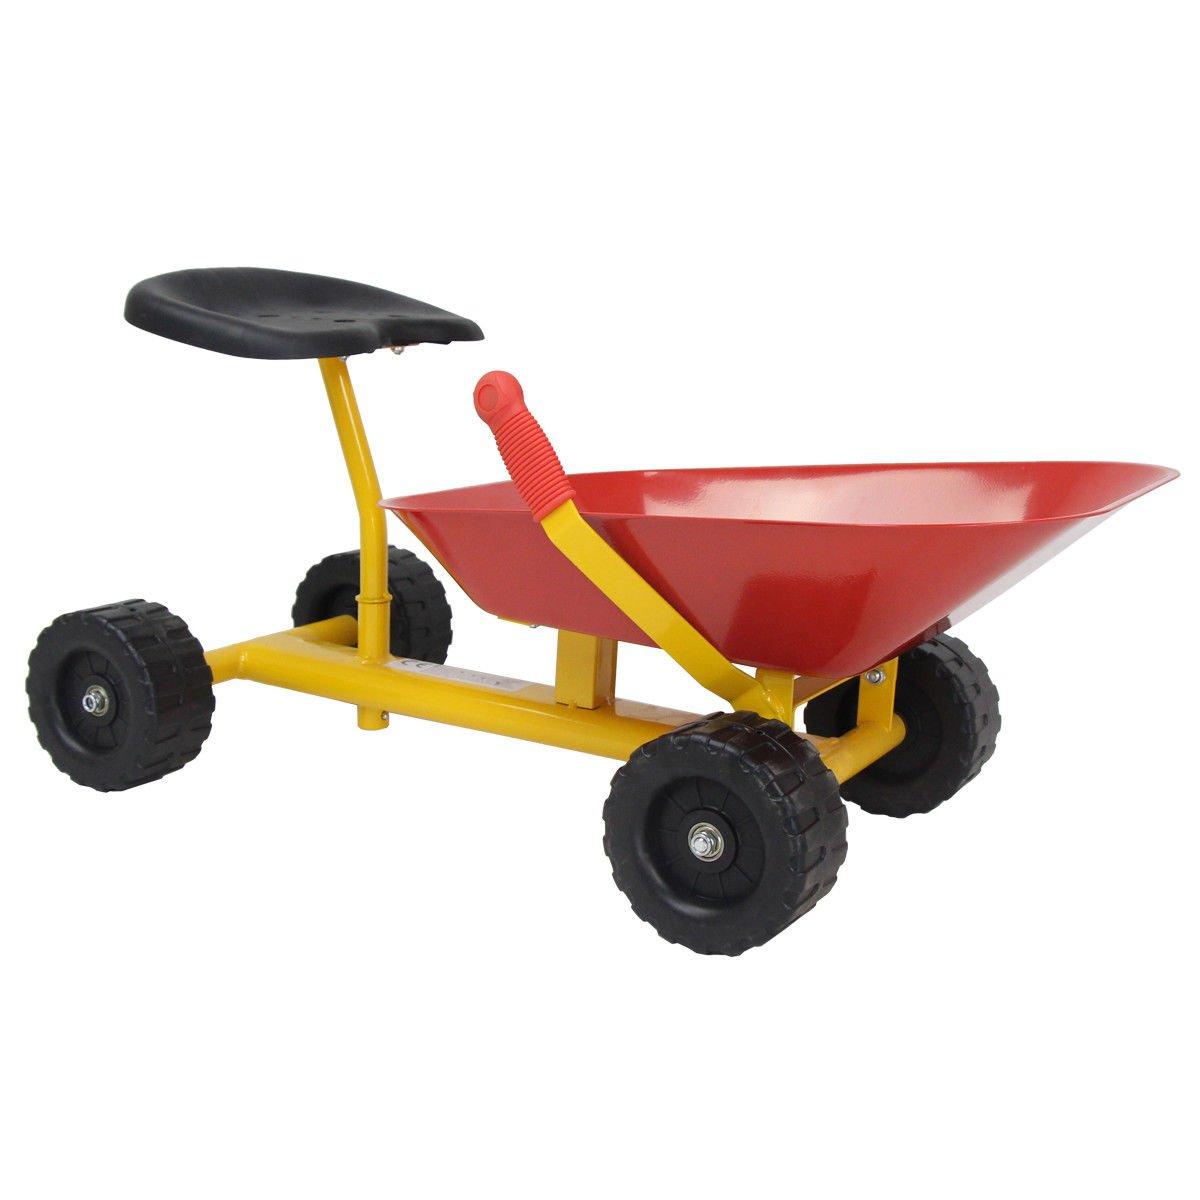 Costzon 8'' Kids Ride-on Sand Dumper, Outdoor Sandbox Toy, Heavy Duty Steel Digging Scooper Excavator Crane with 4 Wheels (Red) by Costzon